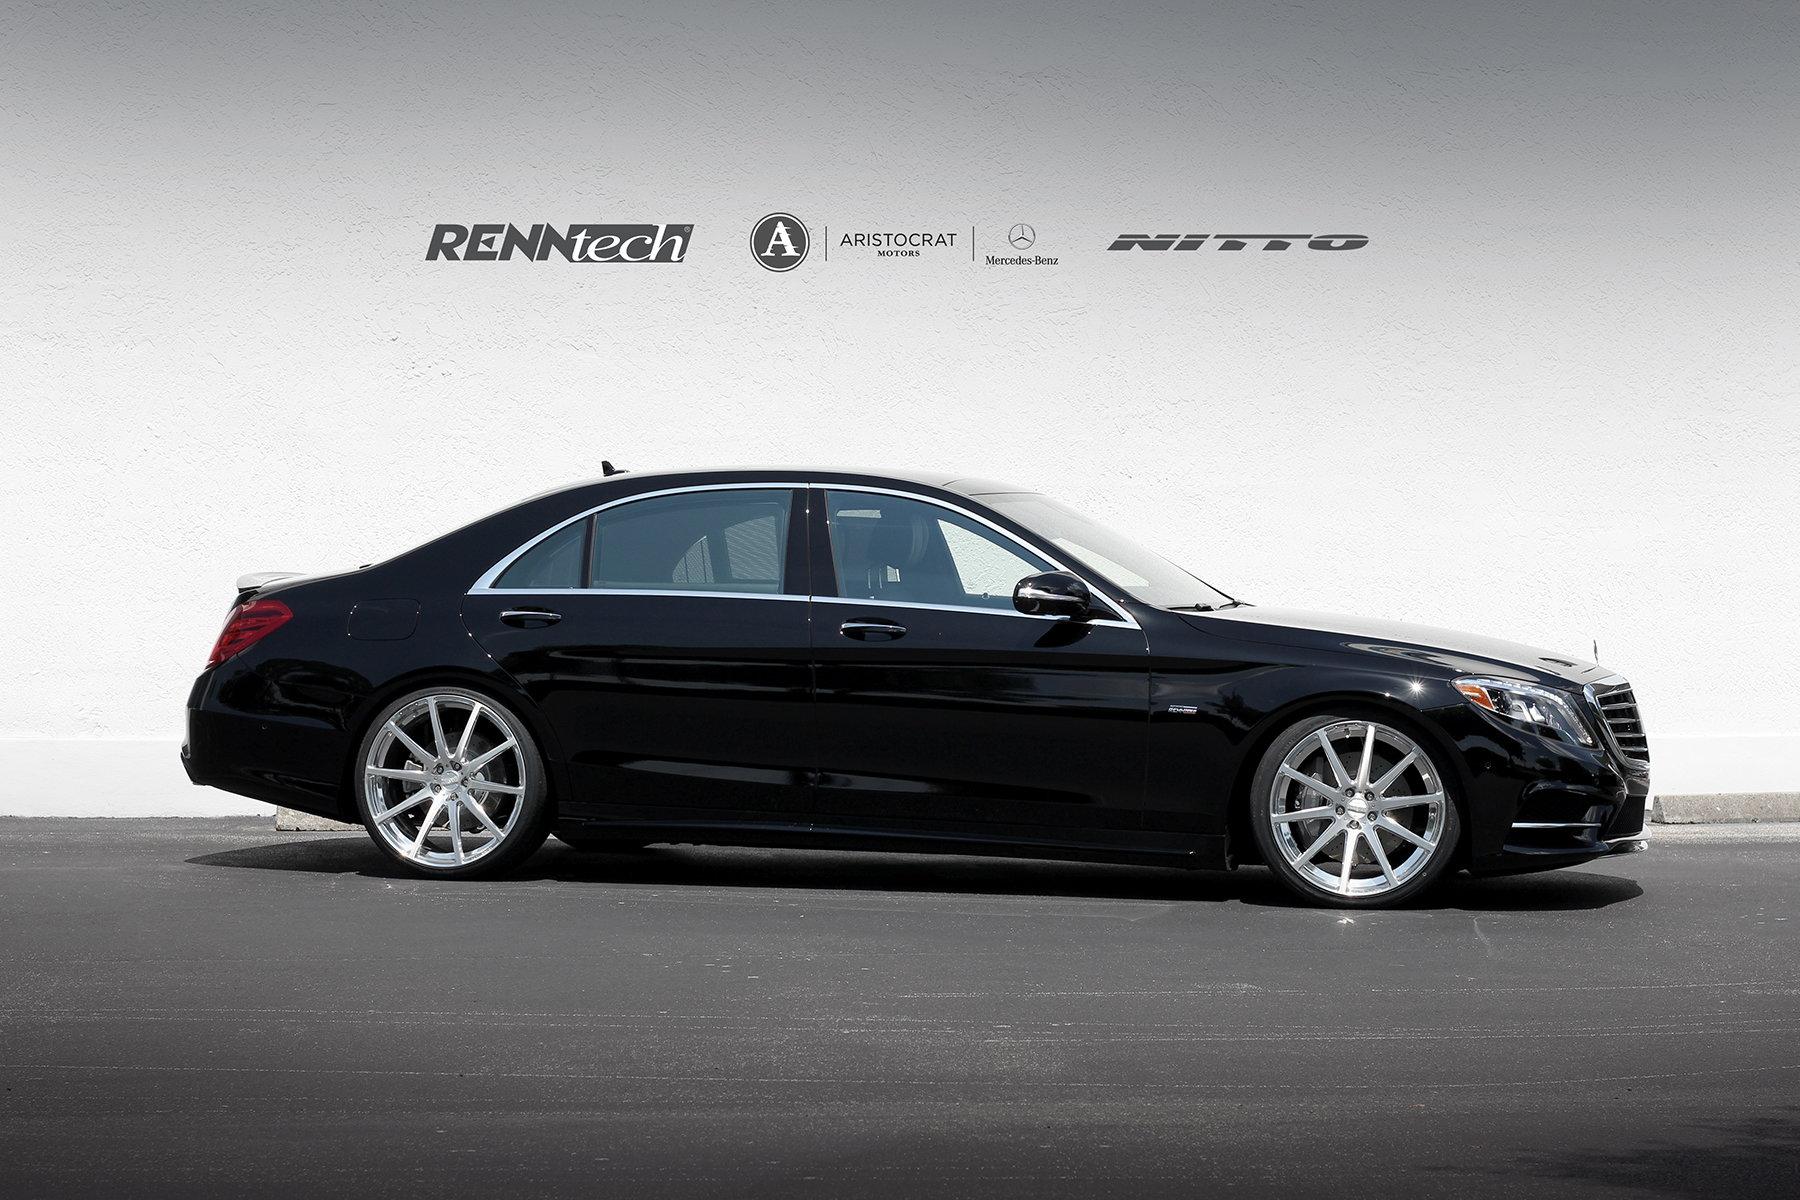 Mercedes-Benz   S 550   RENNtech   Aristocrat - MBWorld ...